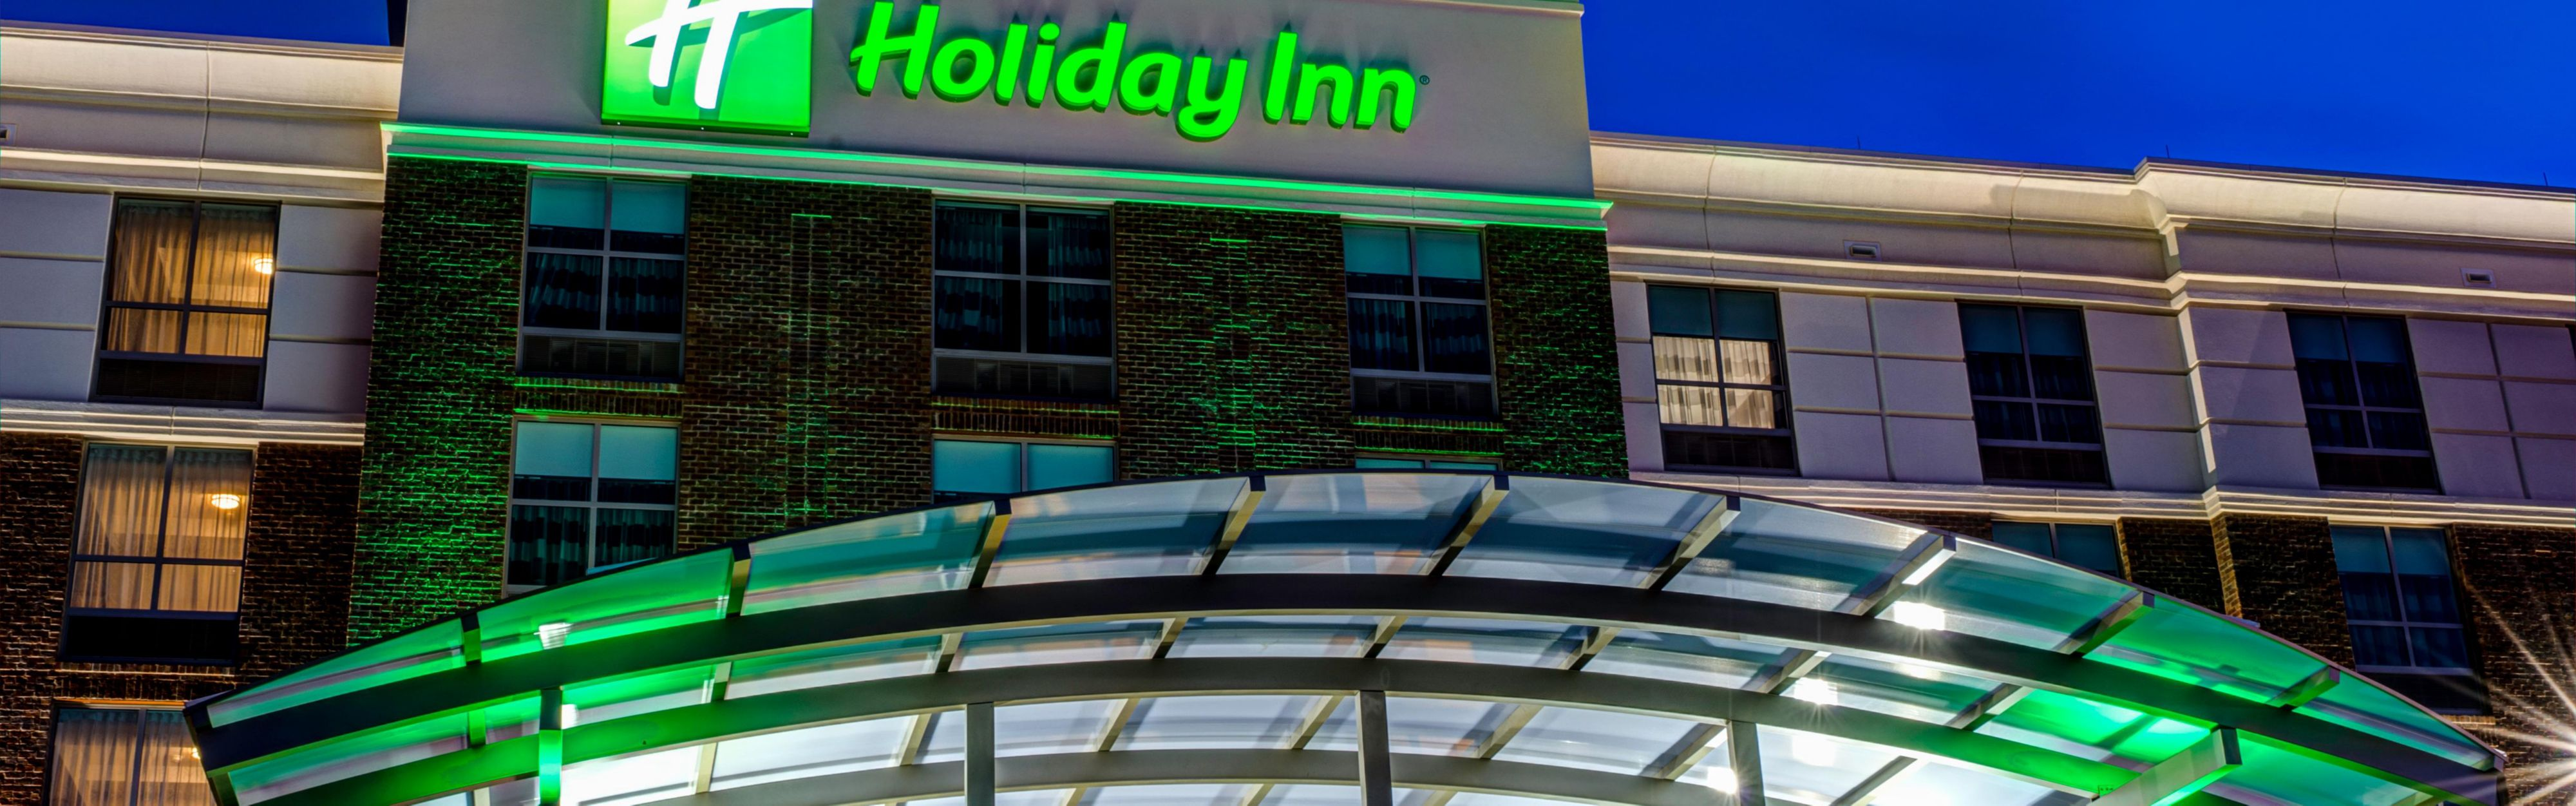 Holiday Inn Owensboro Riverfront image 0